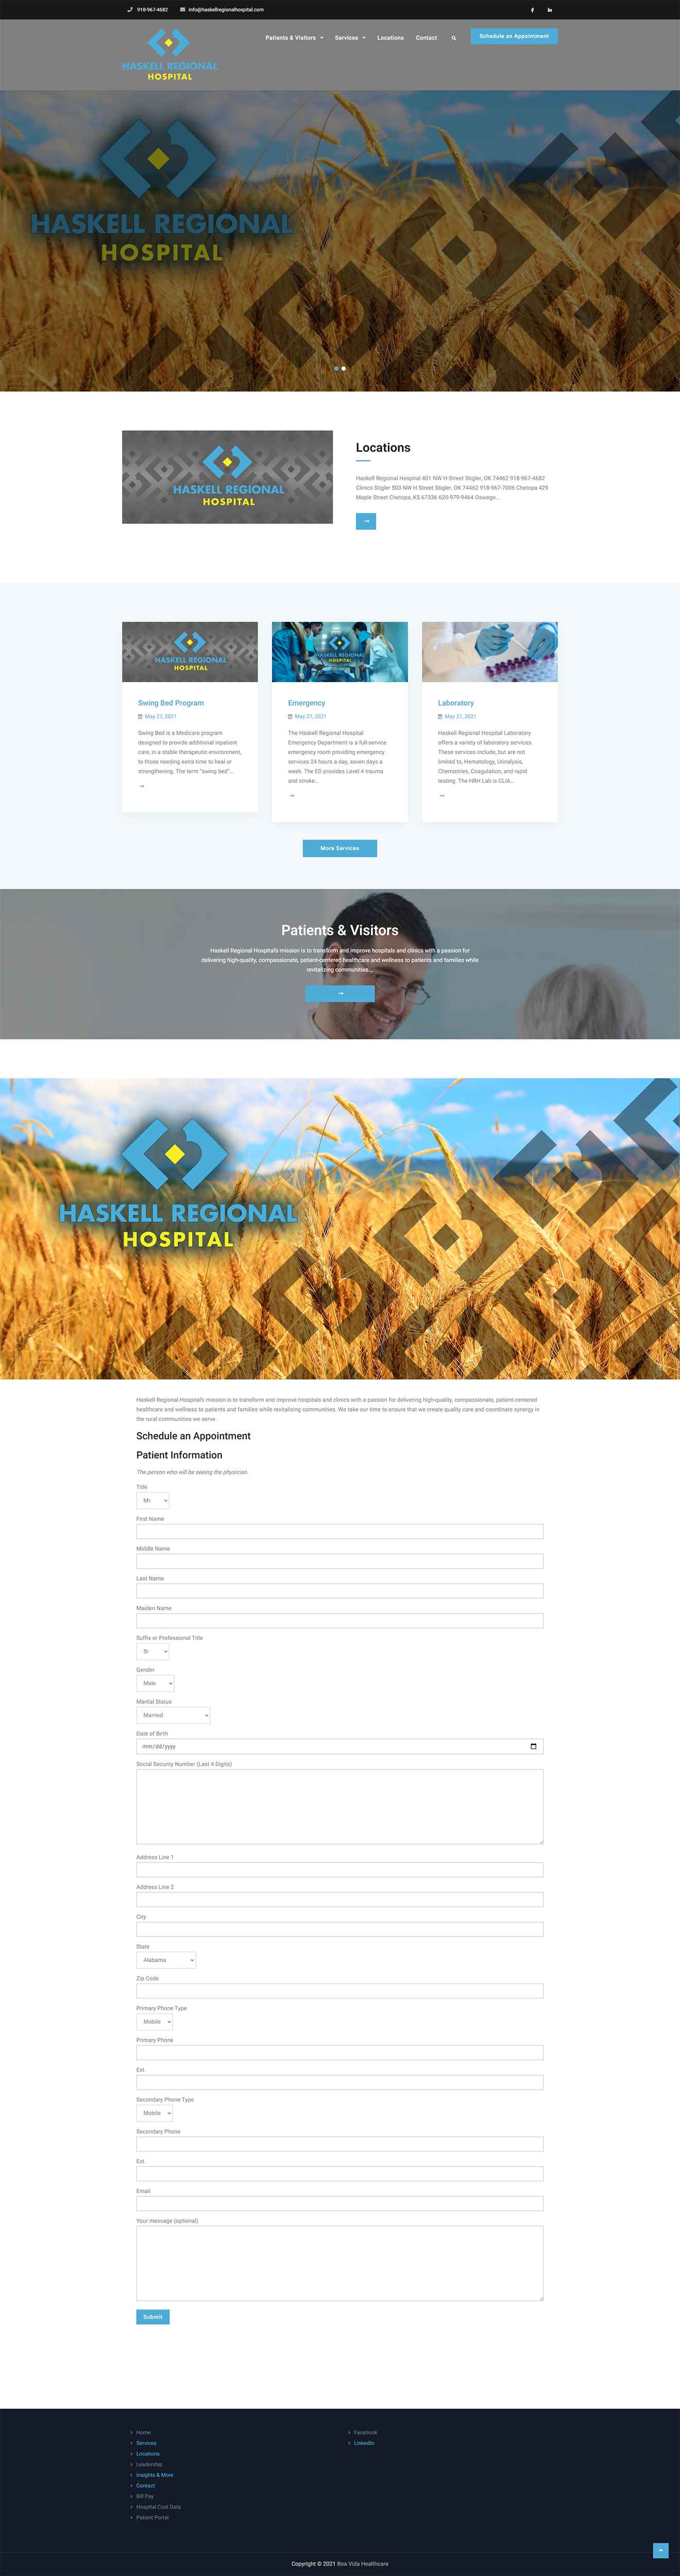 Haskell Regional Hospital Website layout 2021